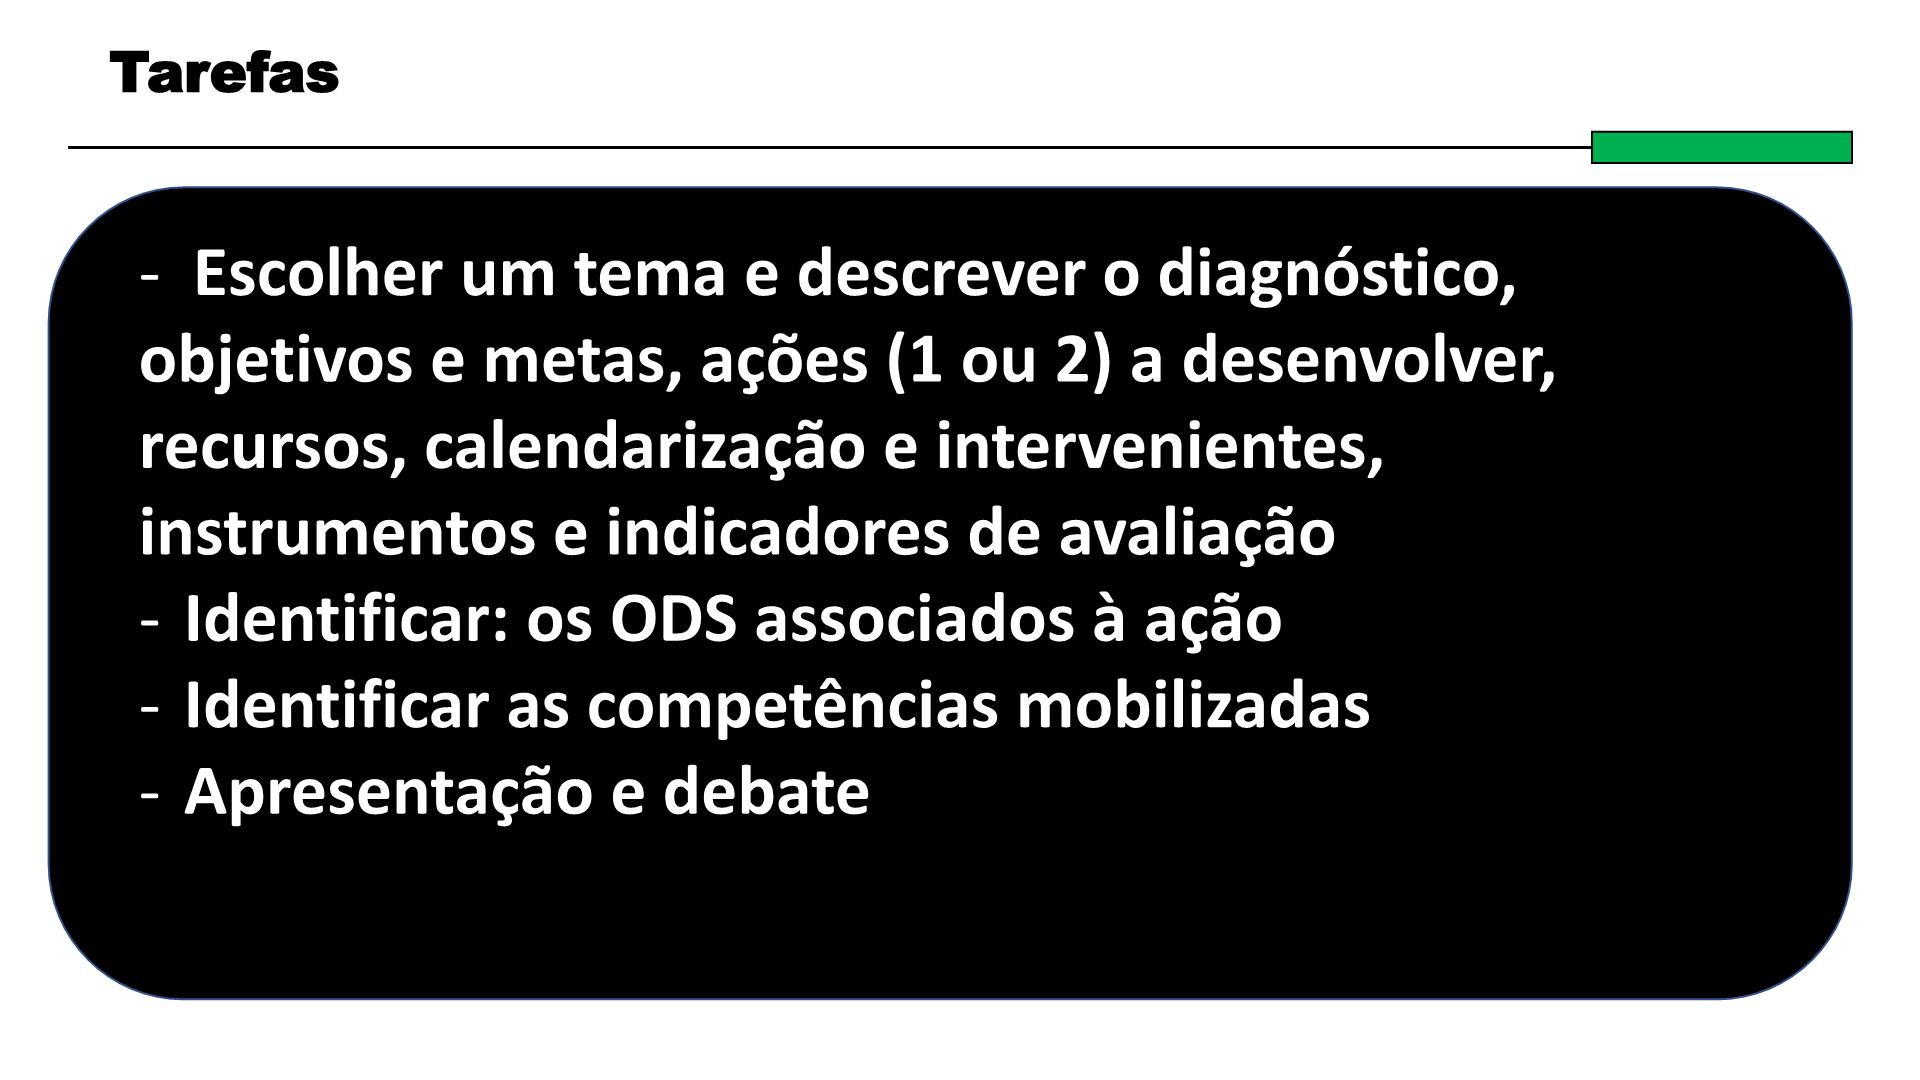 DESCOMPLICAR30